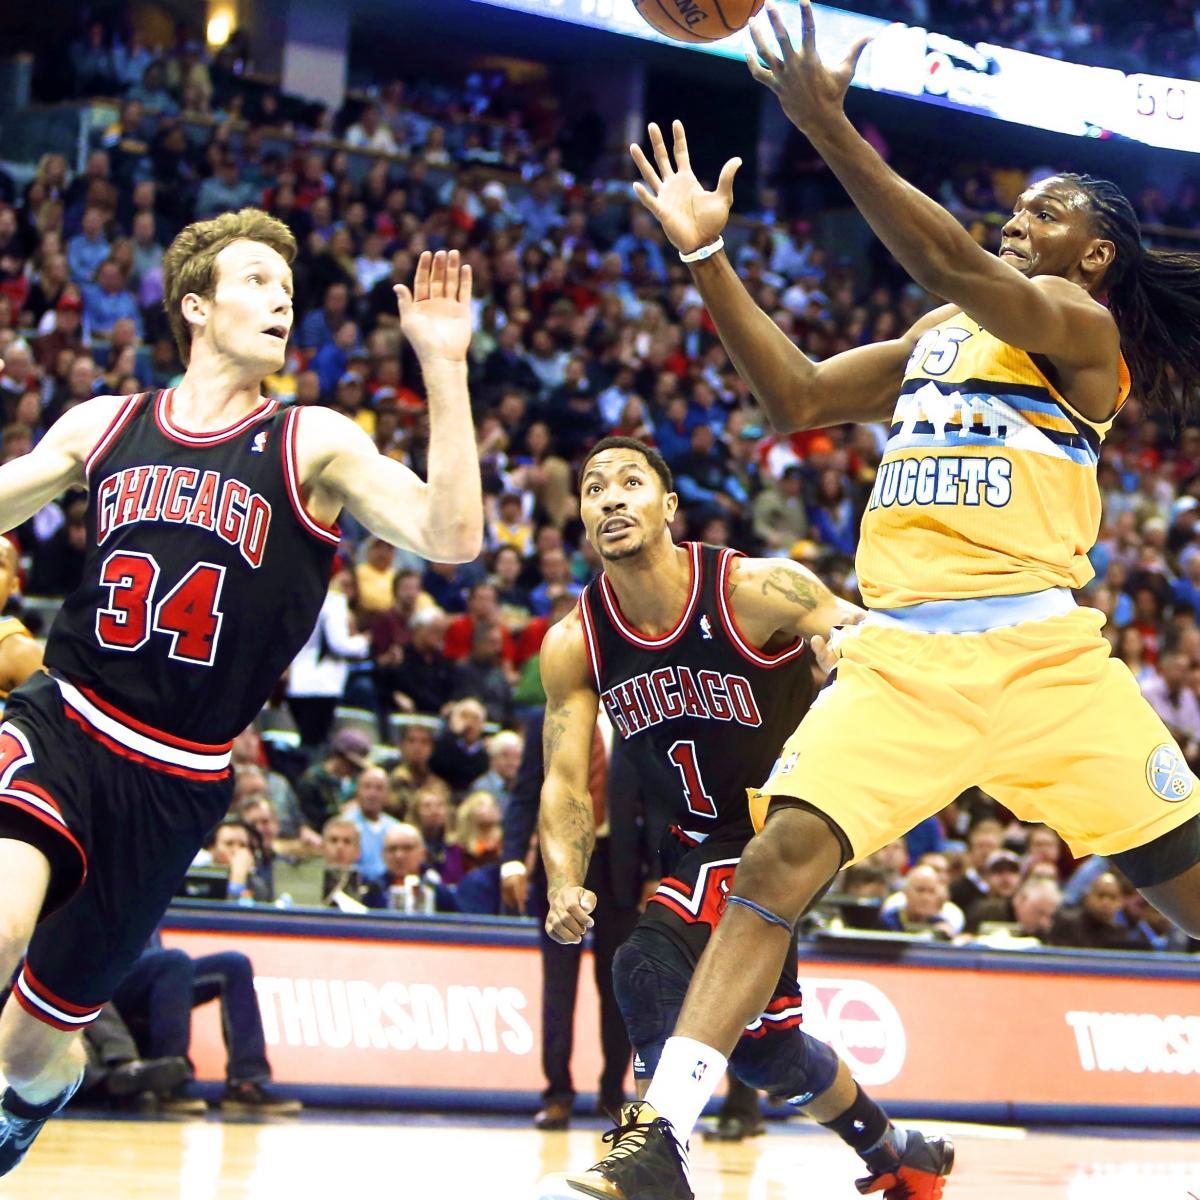 Nuggets Quarter Season Tickets: Chicago Bulls Vs. Denver Nuggets: Live Score And Analysis